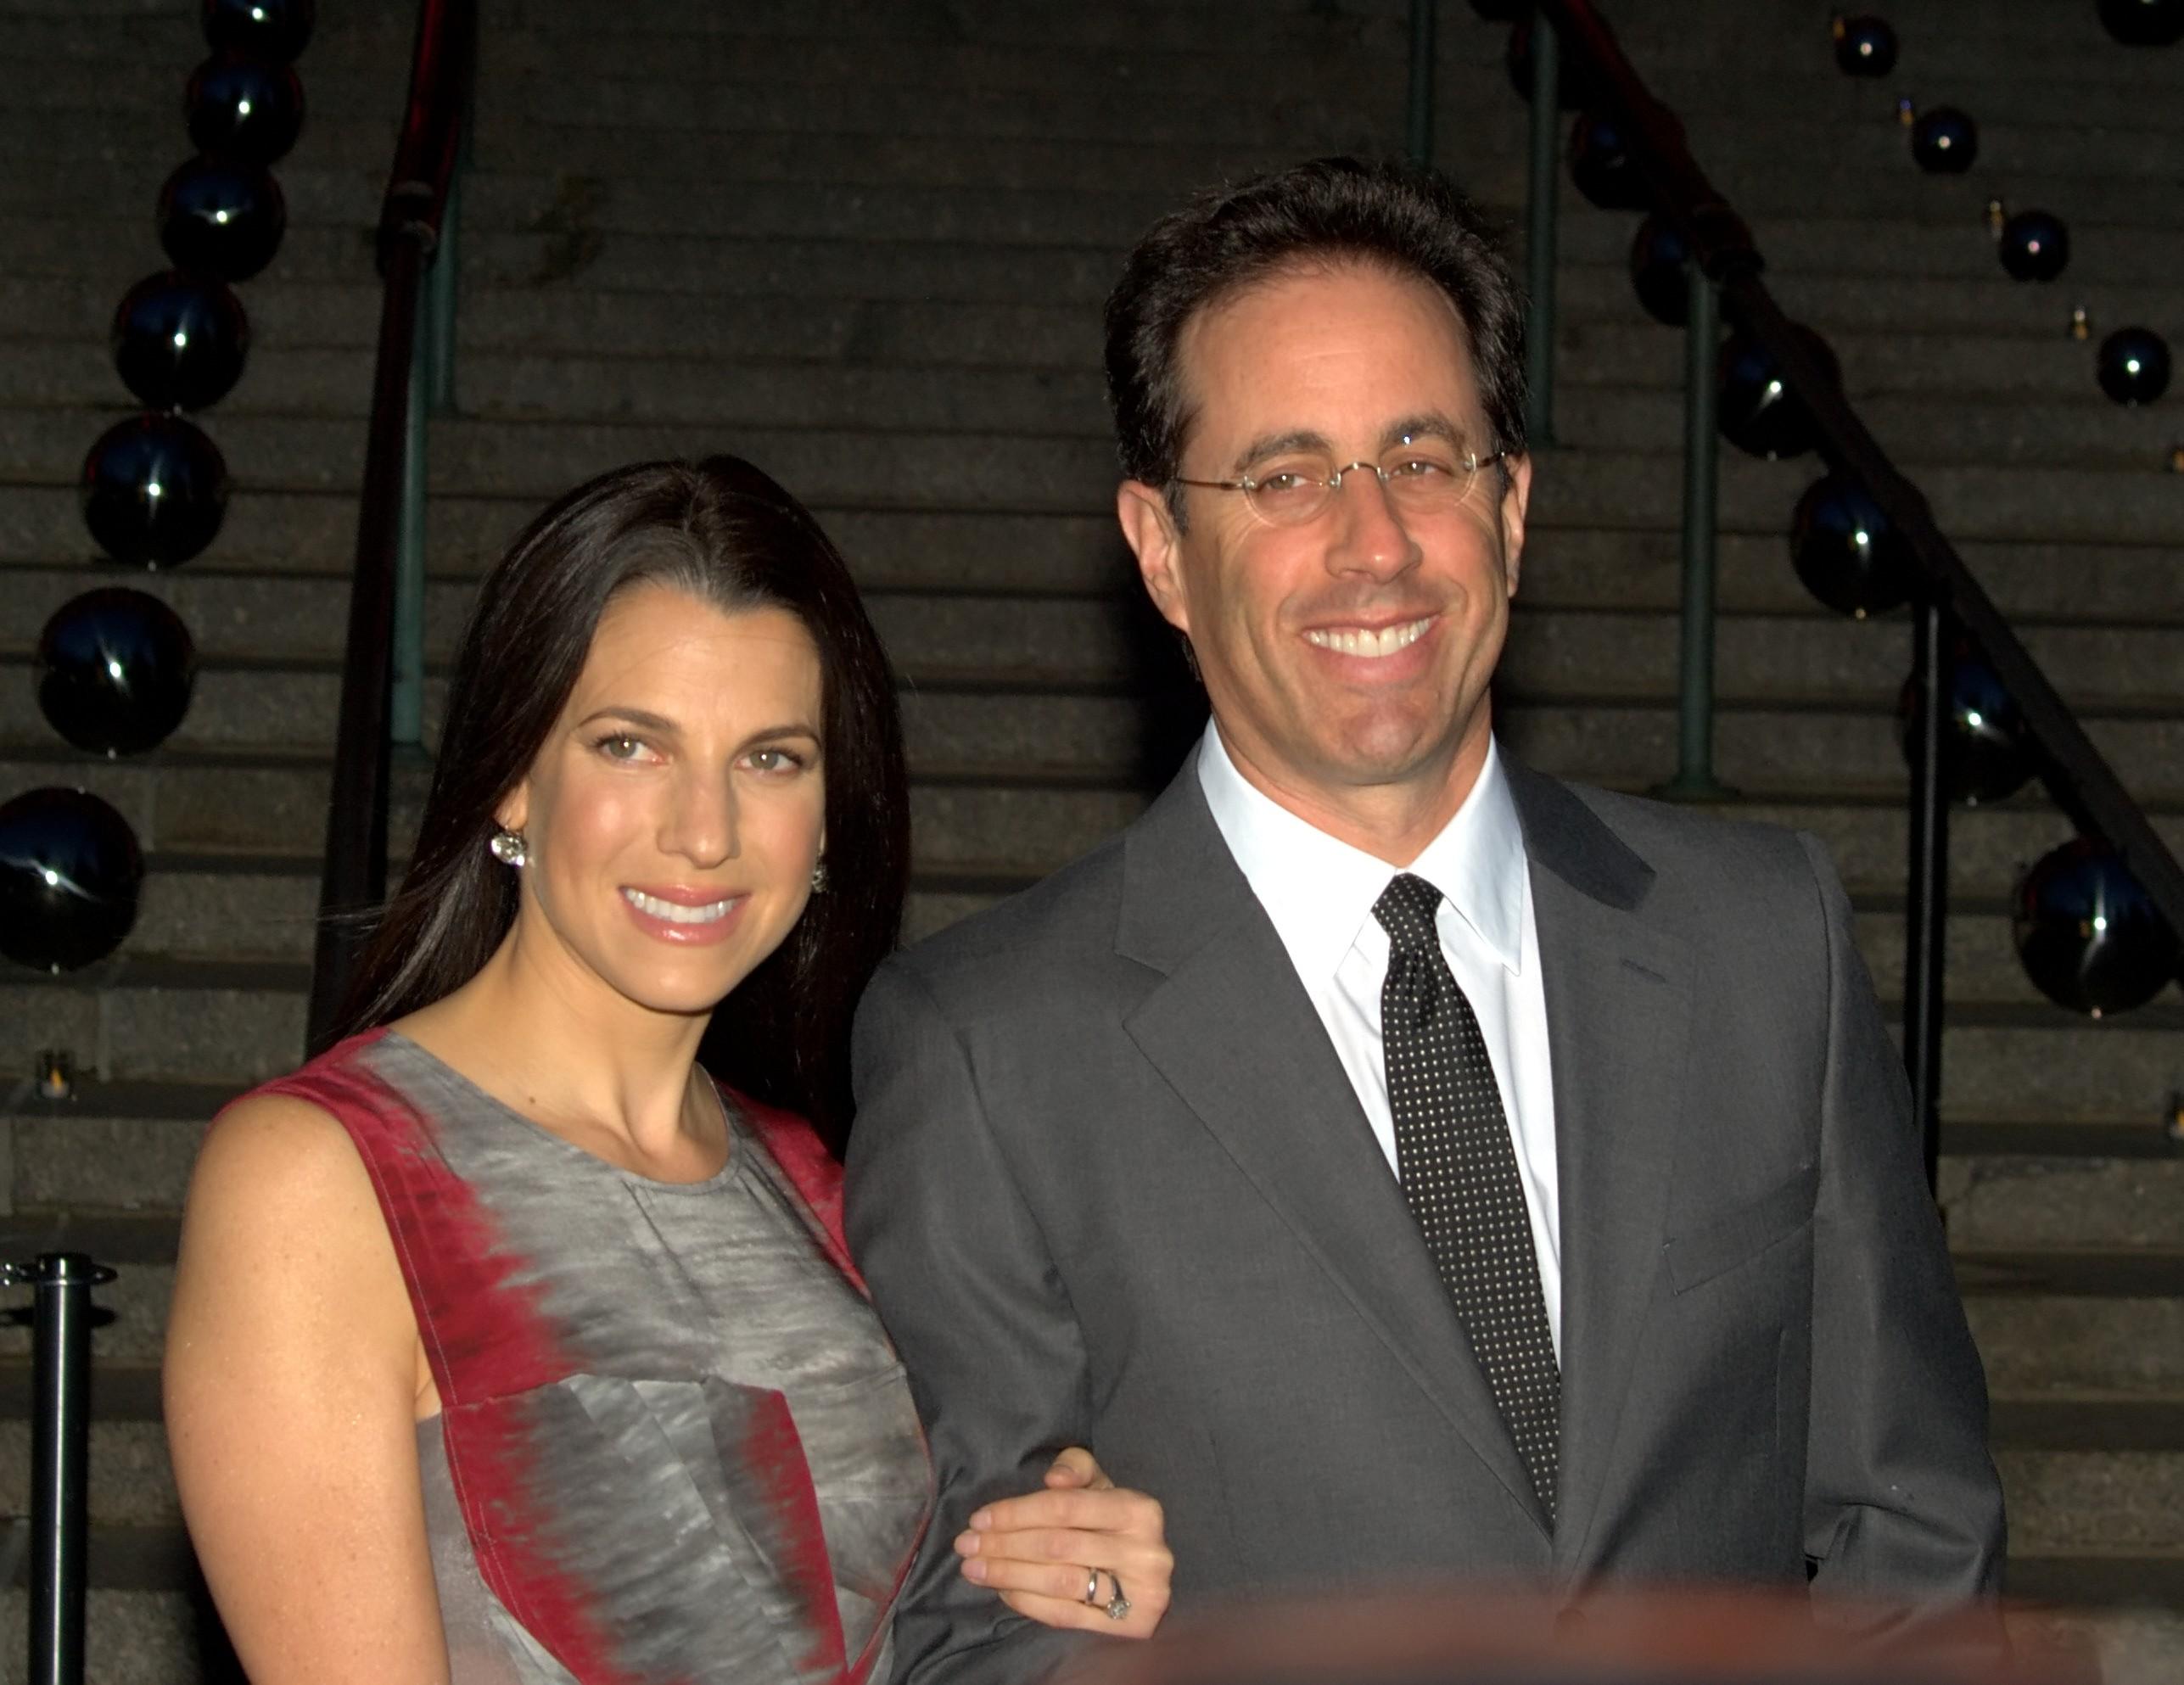 Jessica Seinfeld - Photo Colection